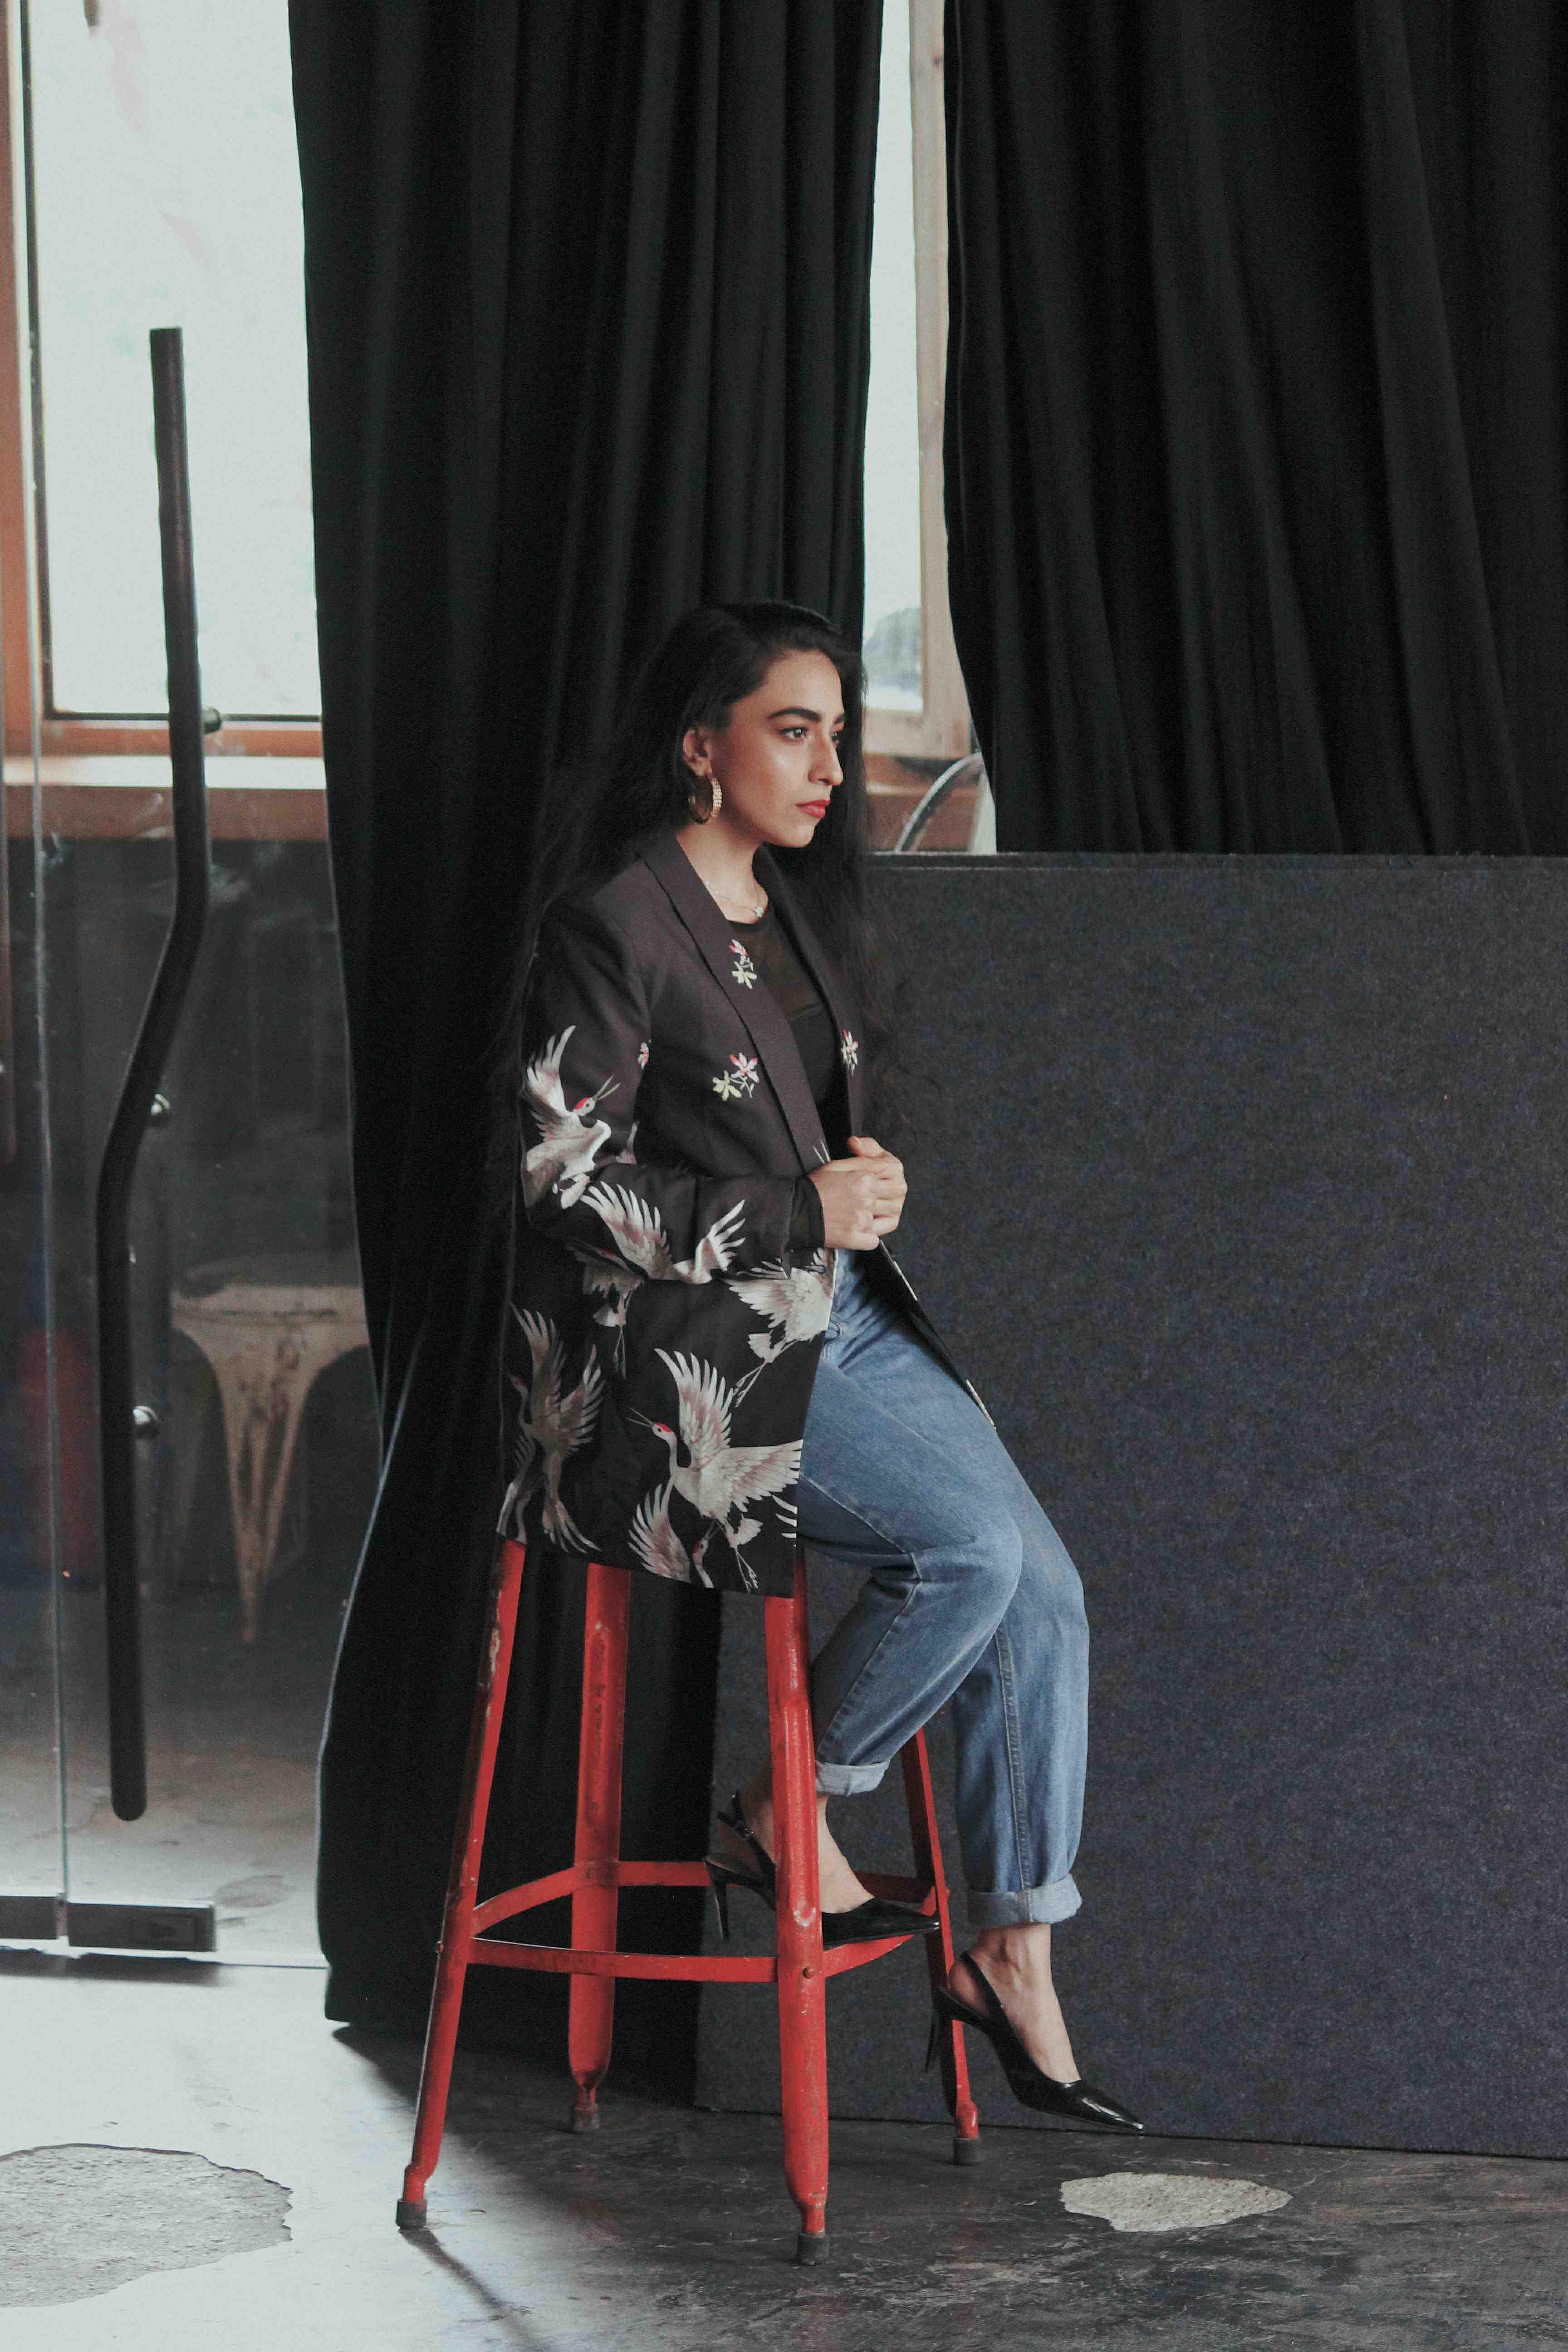 printed blazer, crane print blazer, printed jacket, black blazer, floral blazer, blazer jacket outfit, casual blazer outfit, ootd, stylessential, shein, zara, engraved belt, Shein blazer, party look